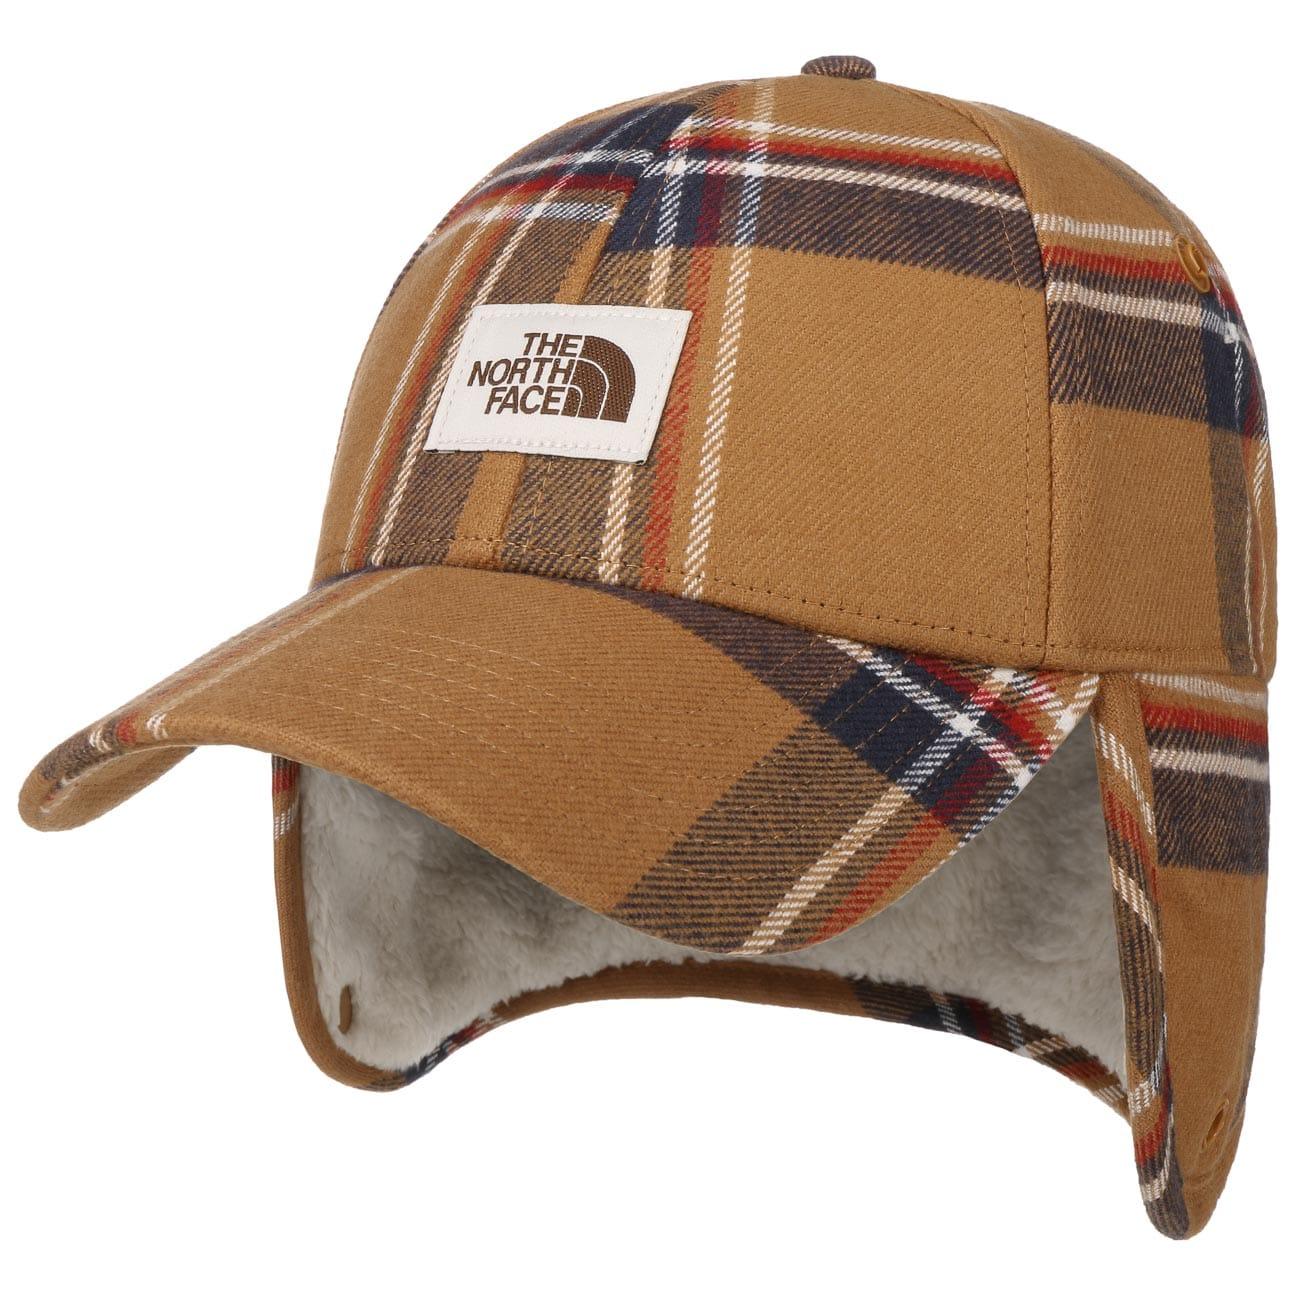 Casquette Campshire Checks by The North Face  casquette en coton